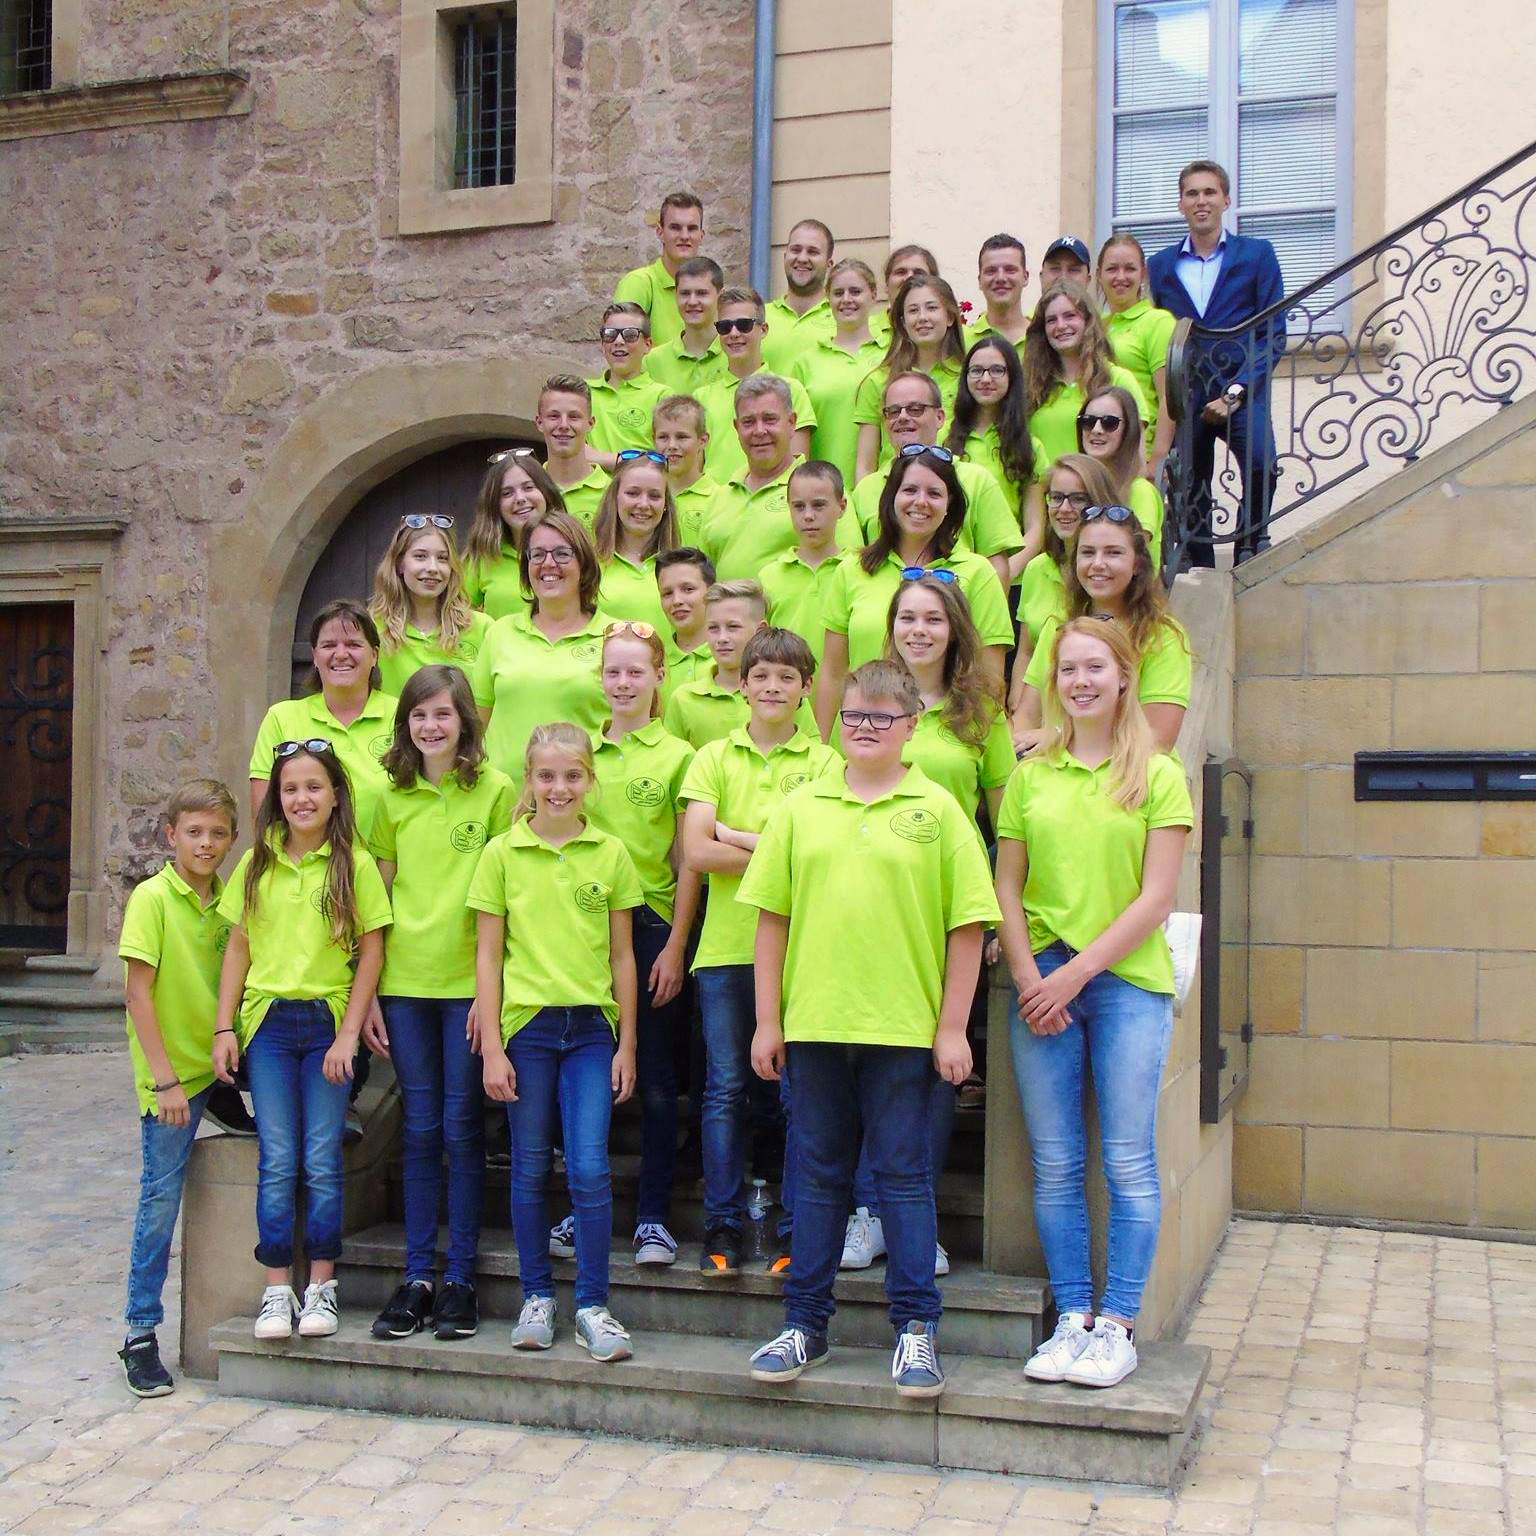 Uitwisselingsconcert studieorkest fanfare Helpt Elkander